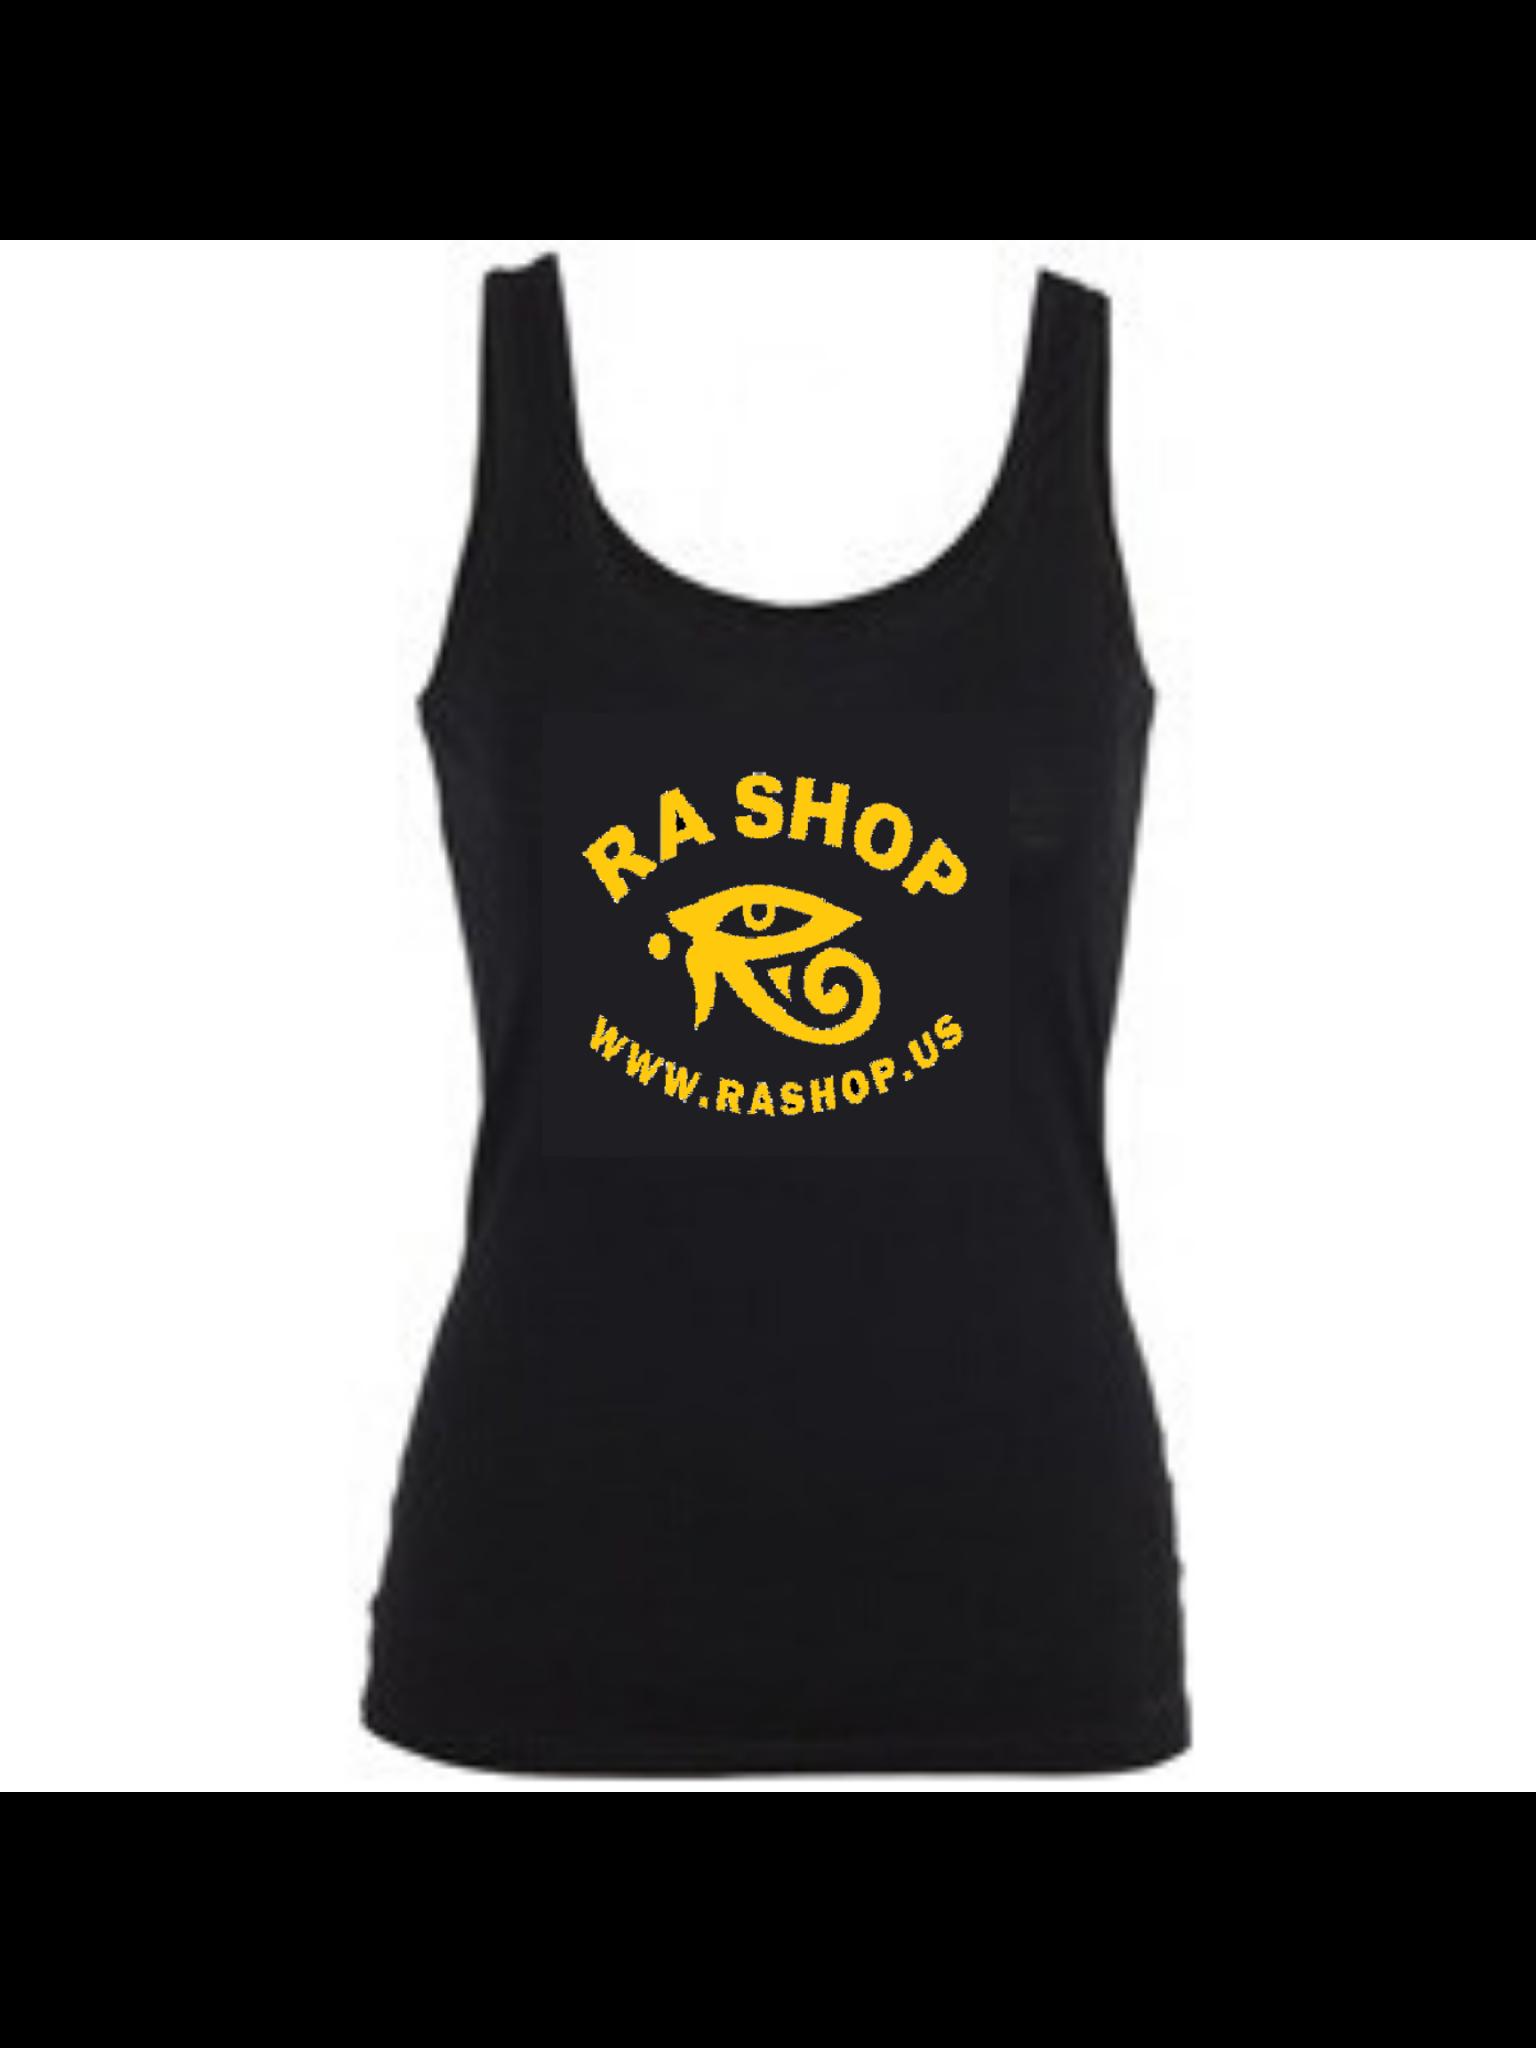 Ra Shop Black Tank Top 2XL